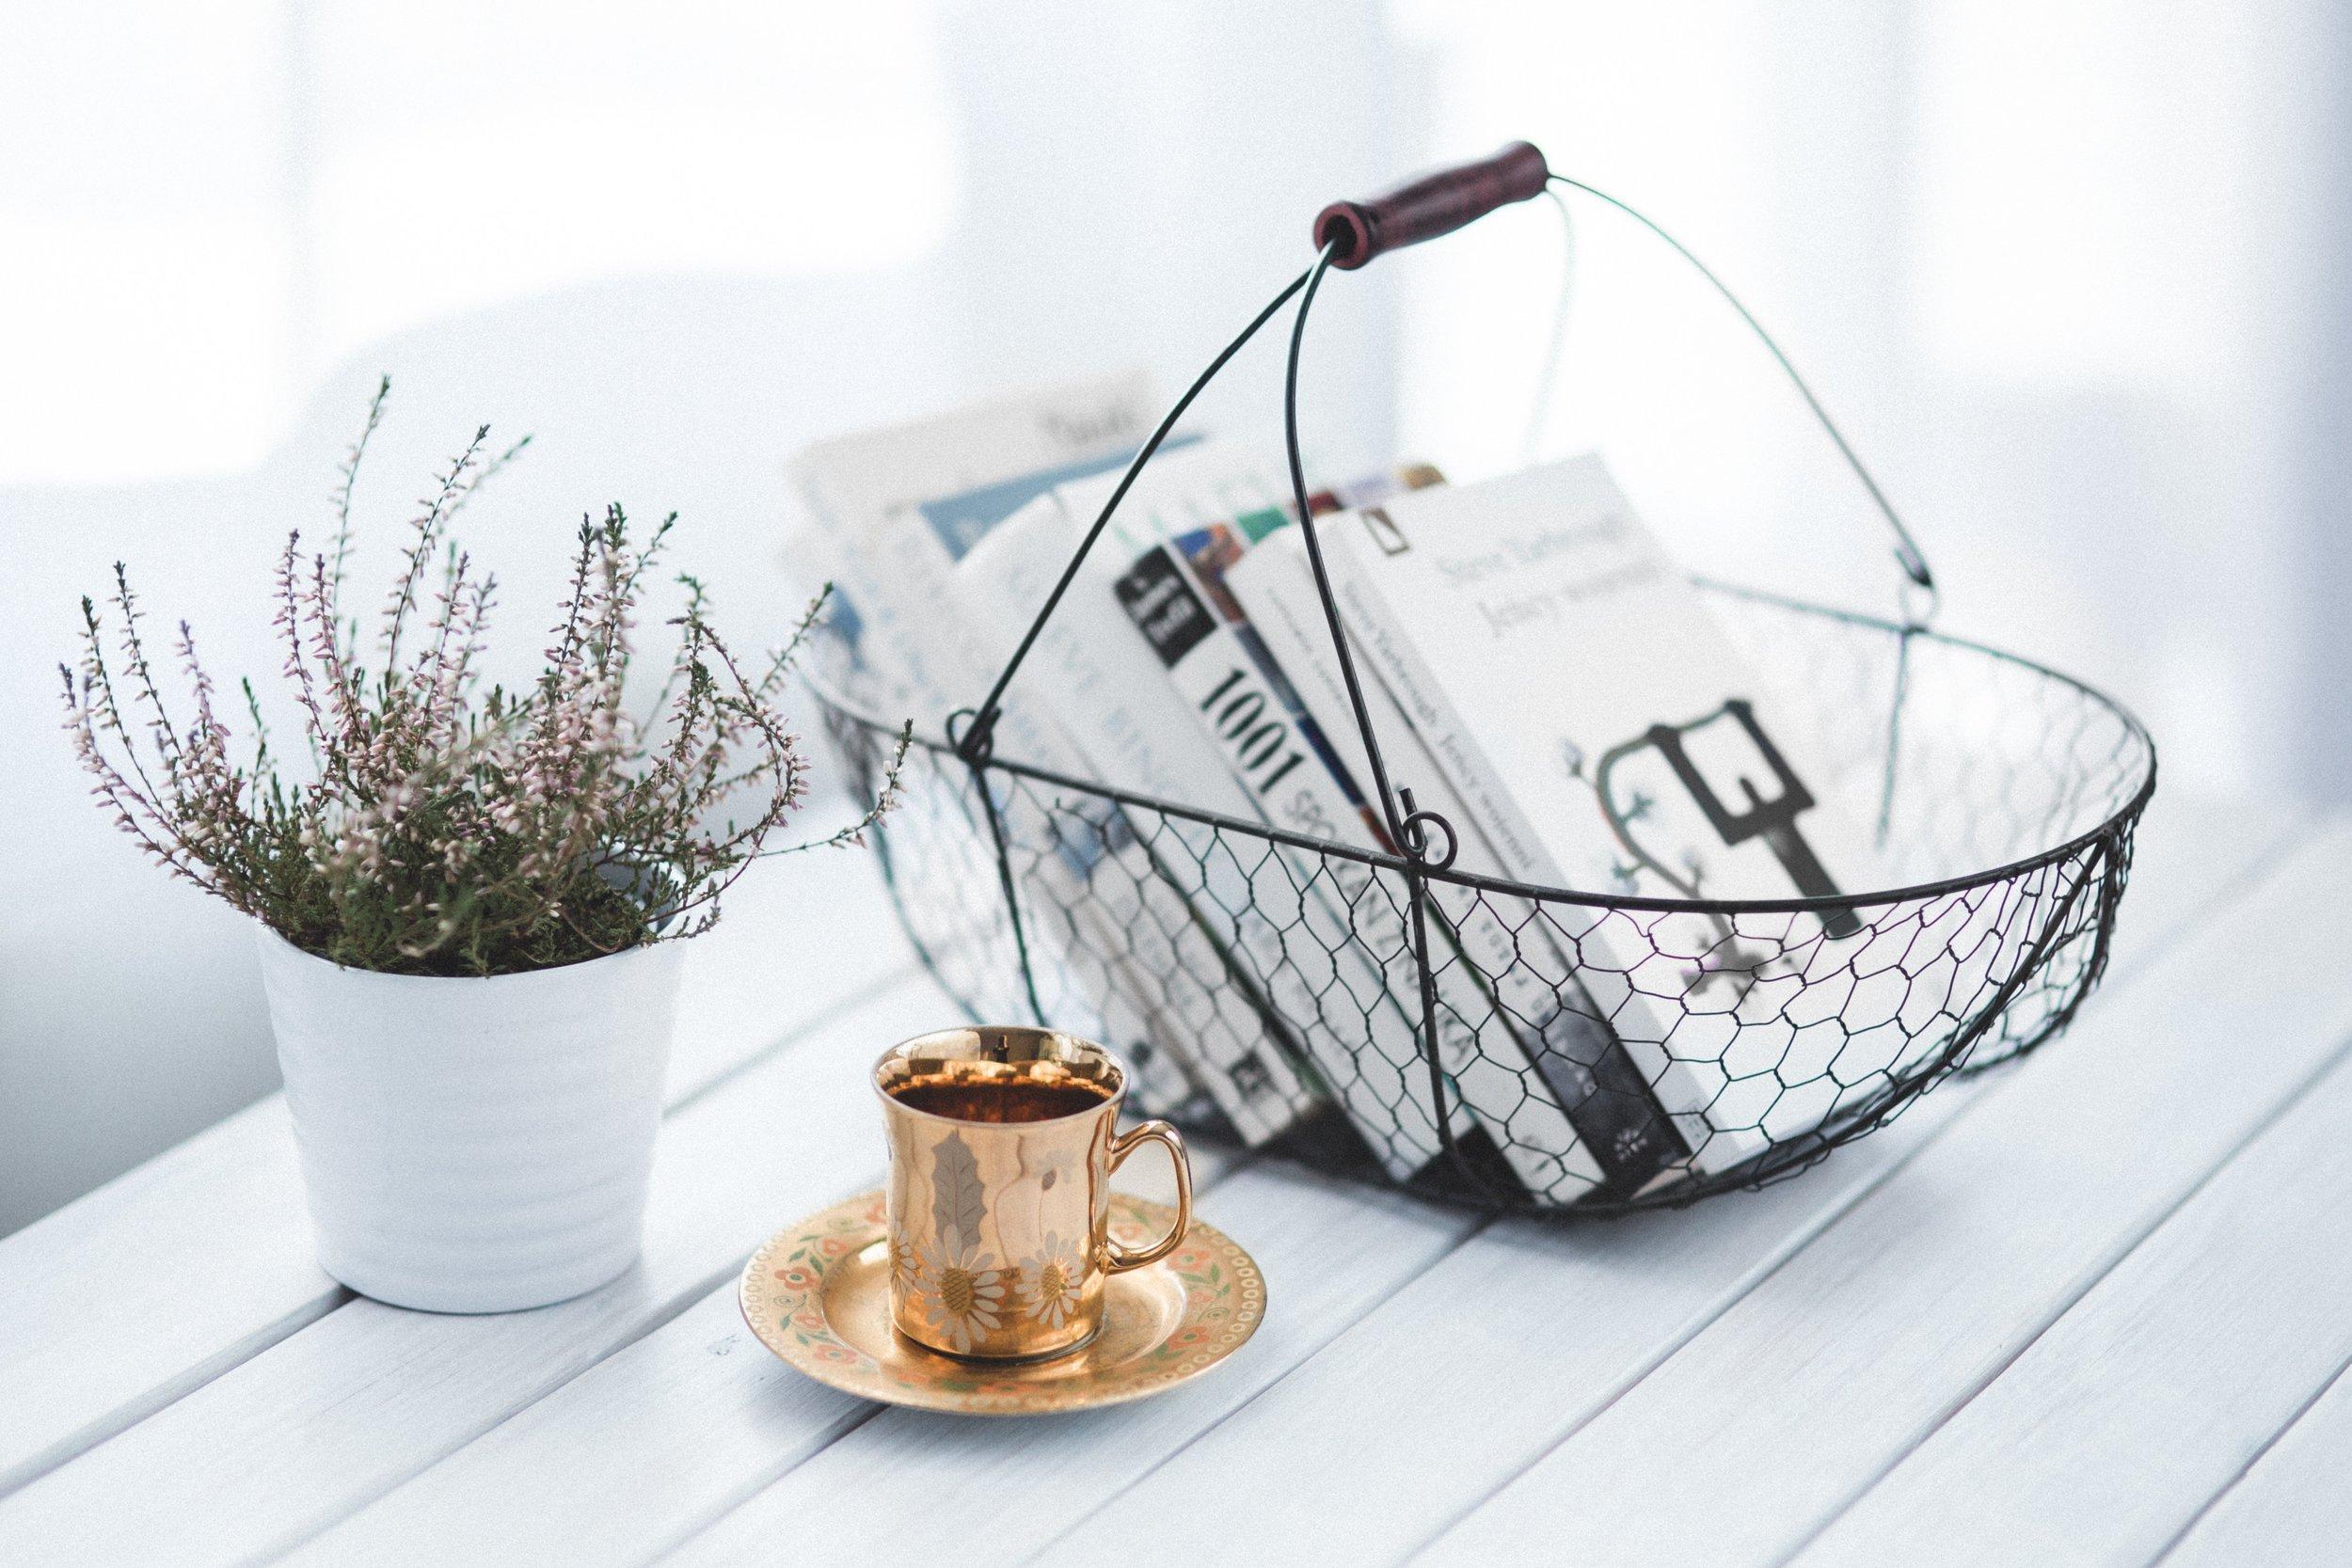 basket-book-books-6332.jpg